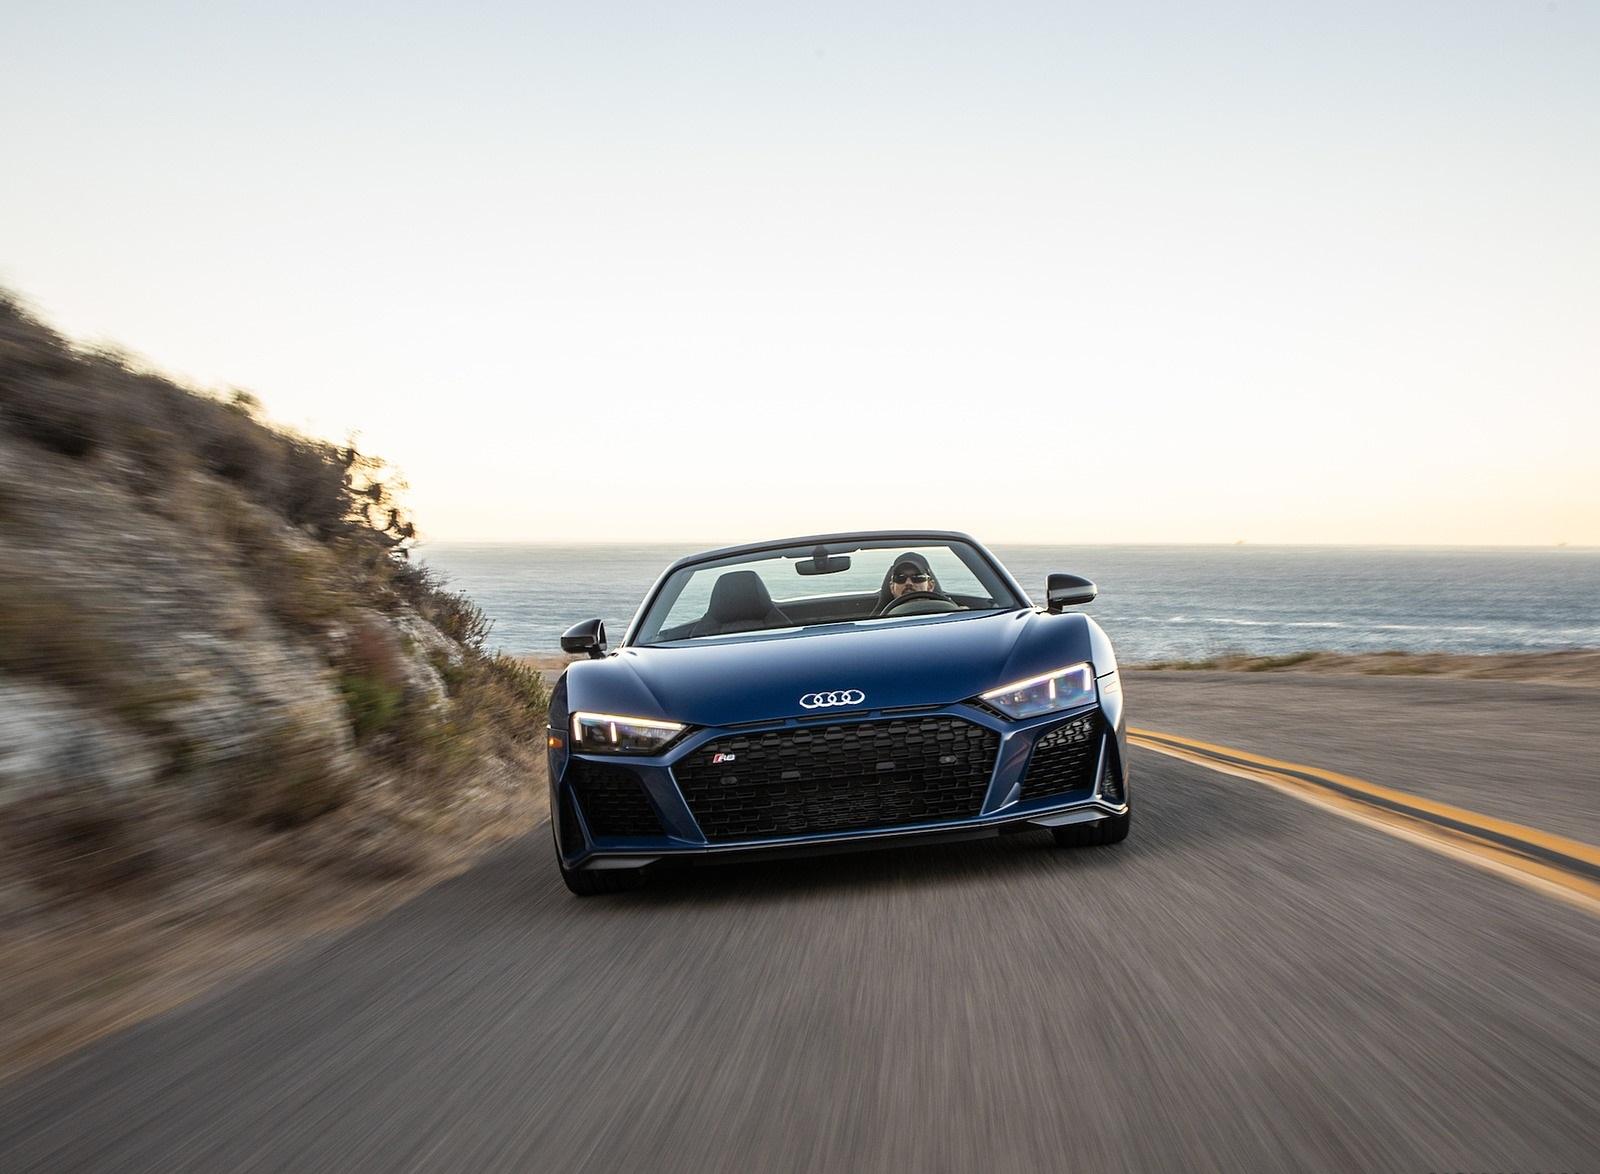 2020 Audi R8 Spyder (US-Spec) Front Wallpapers (8)